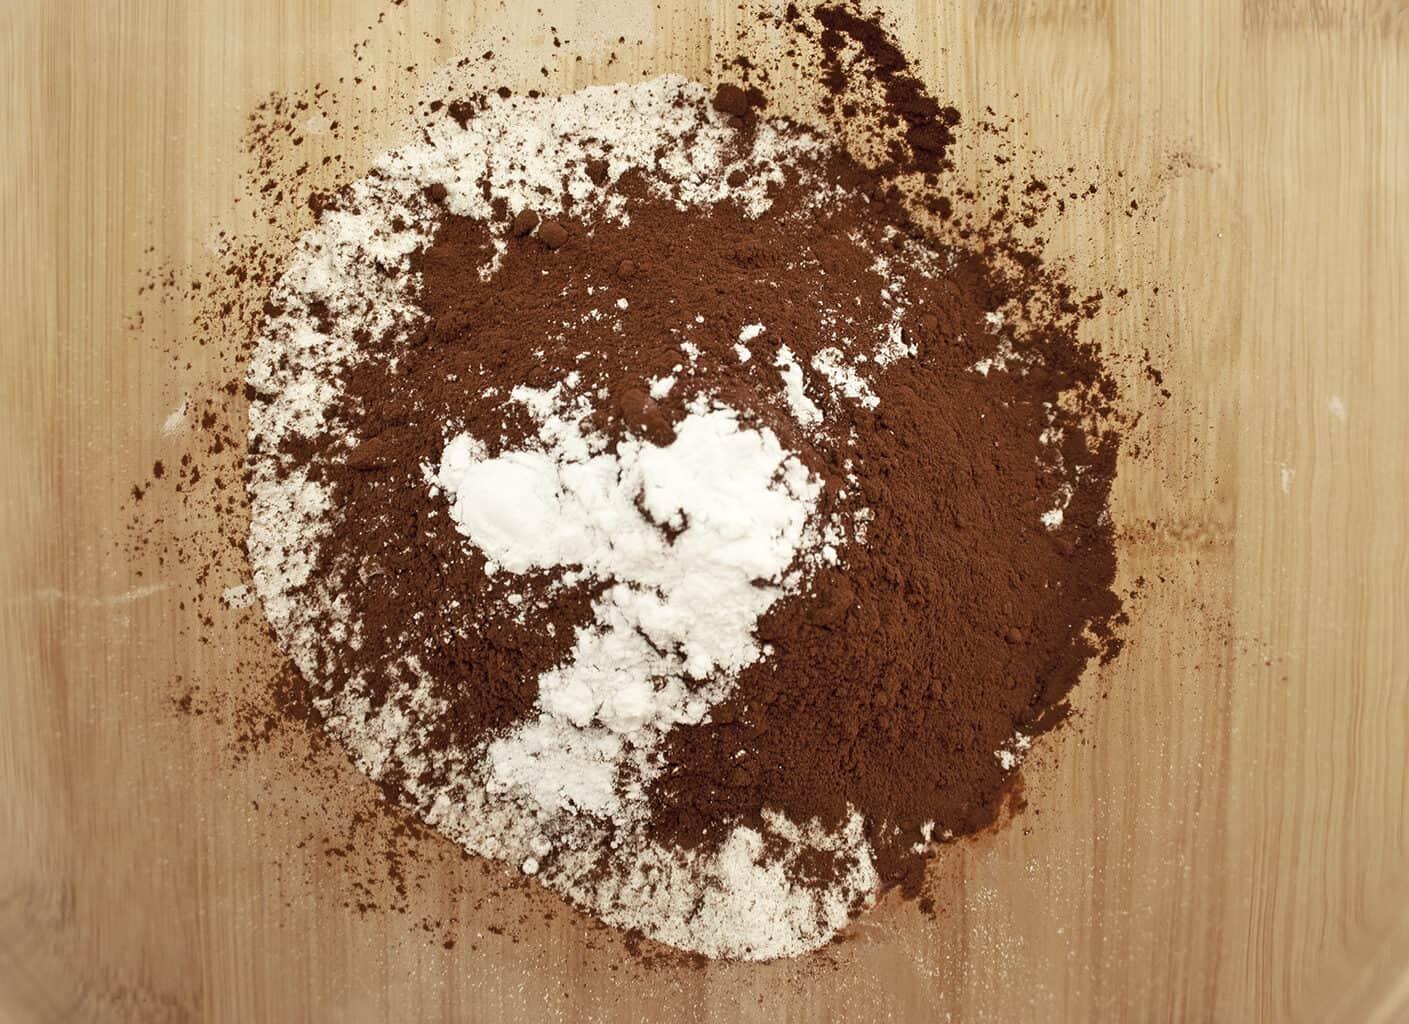 flour cocoa powder and baking powder